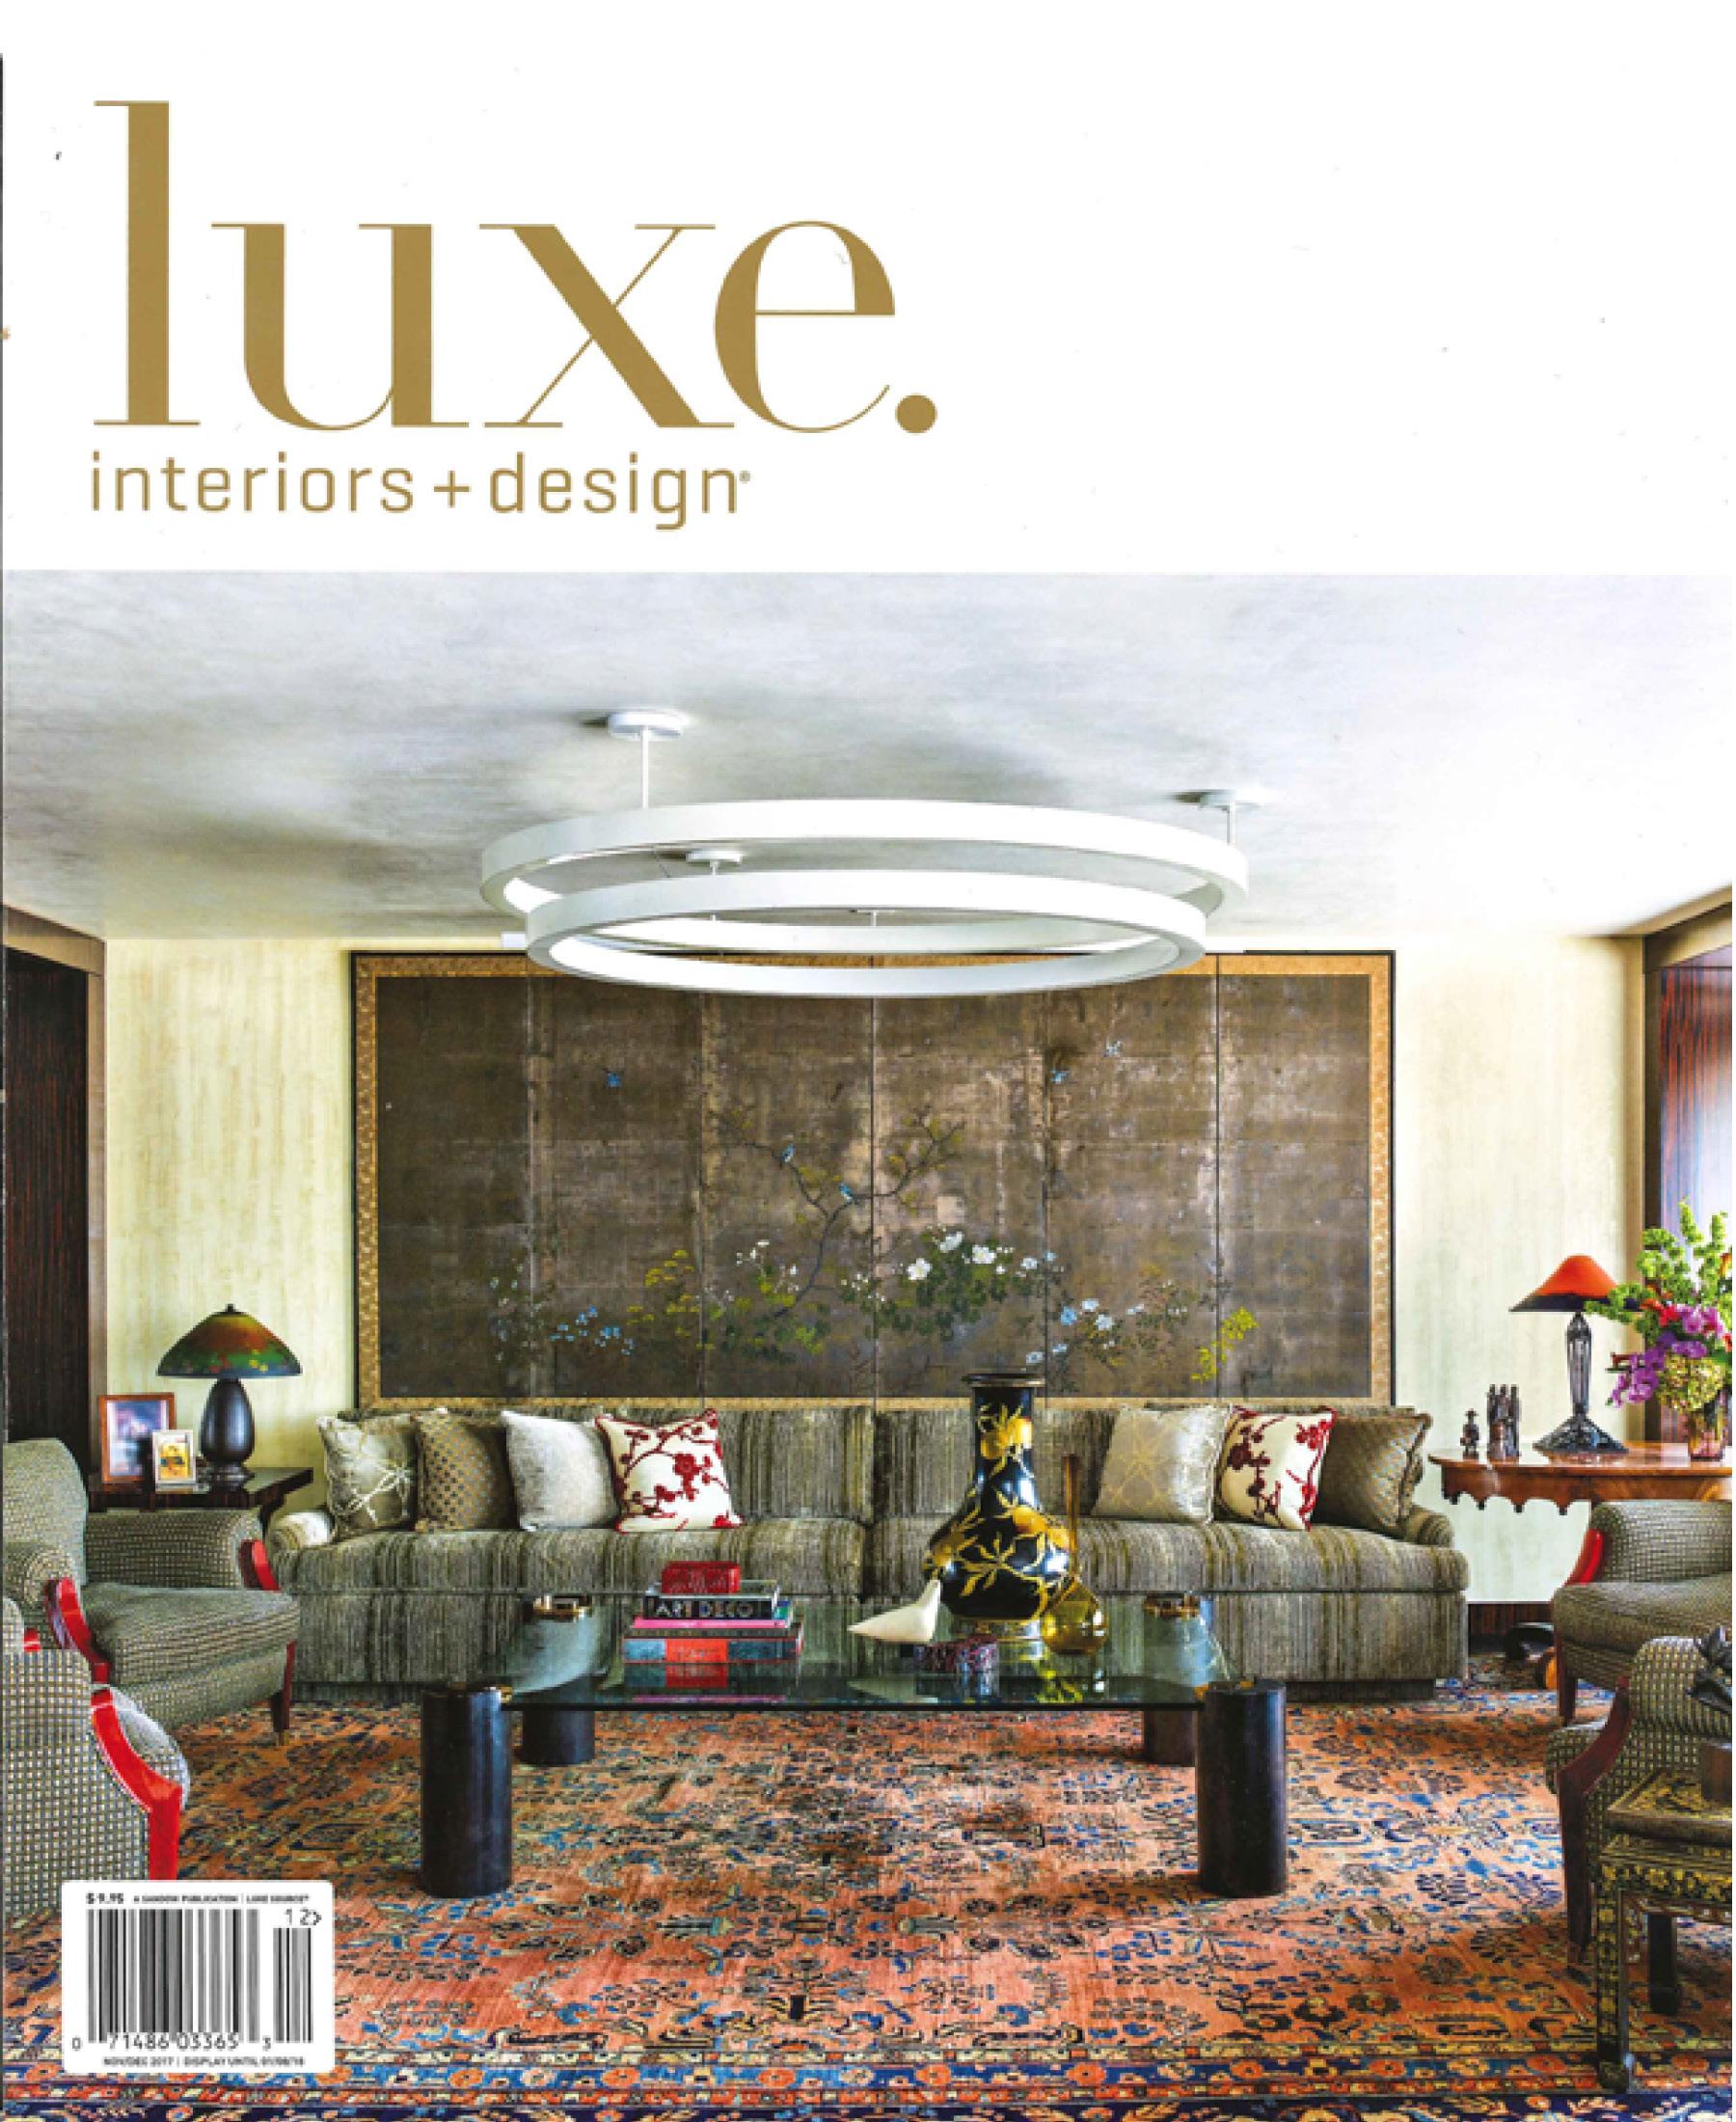 Luxe Interiors + Design National, December 2017